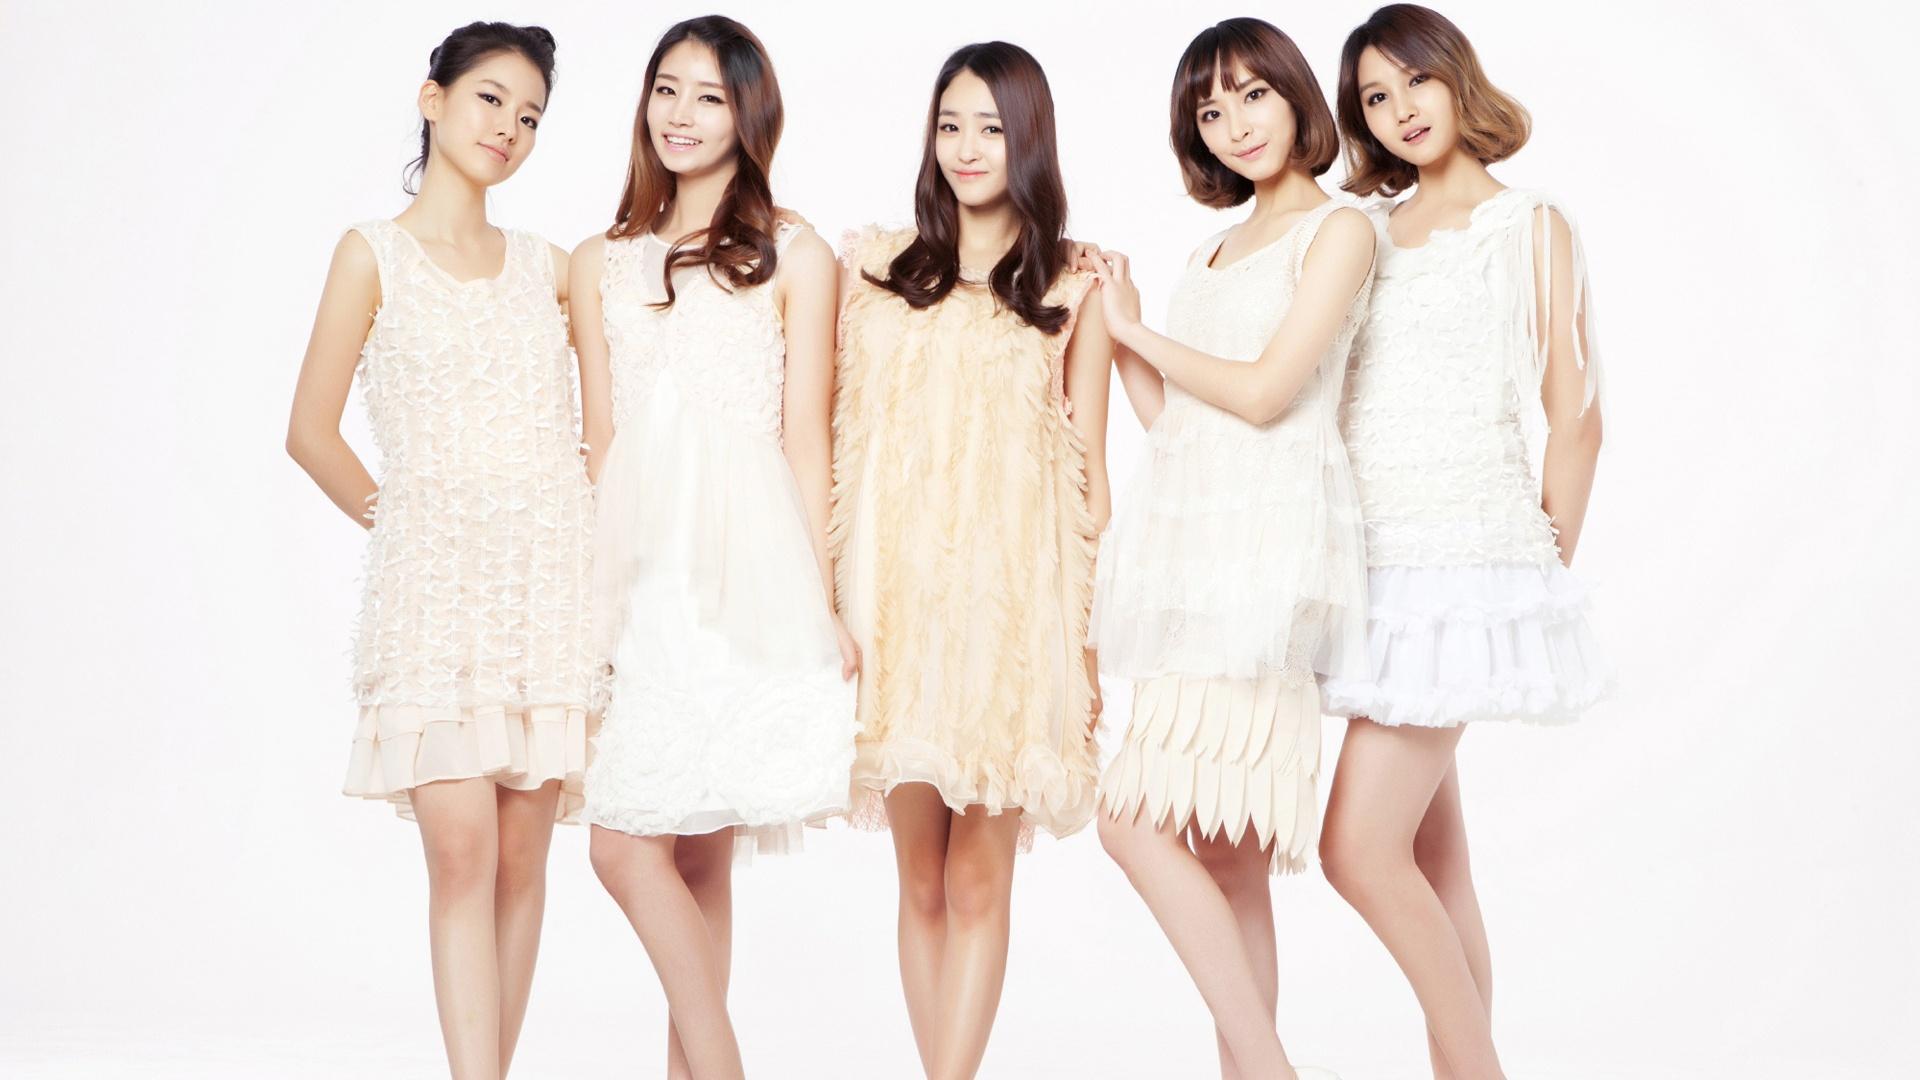 Wallpaper CHI CHI Korean music girl group 07 1920x1200 HD